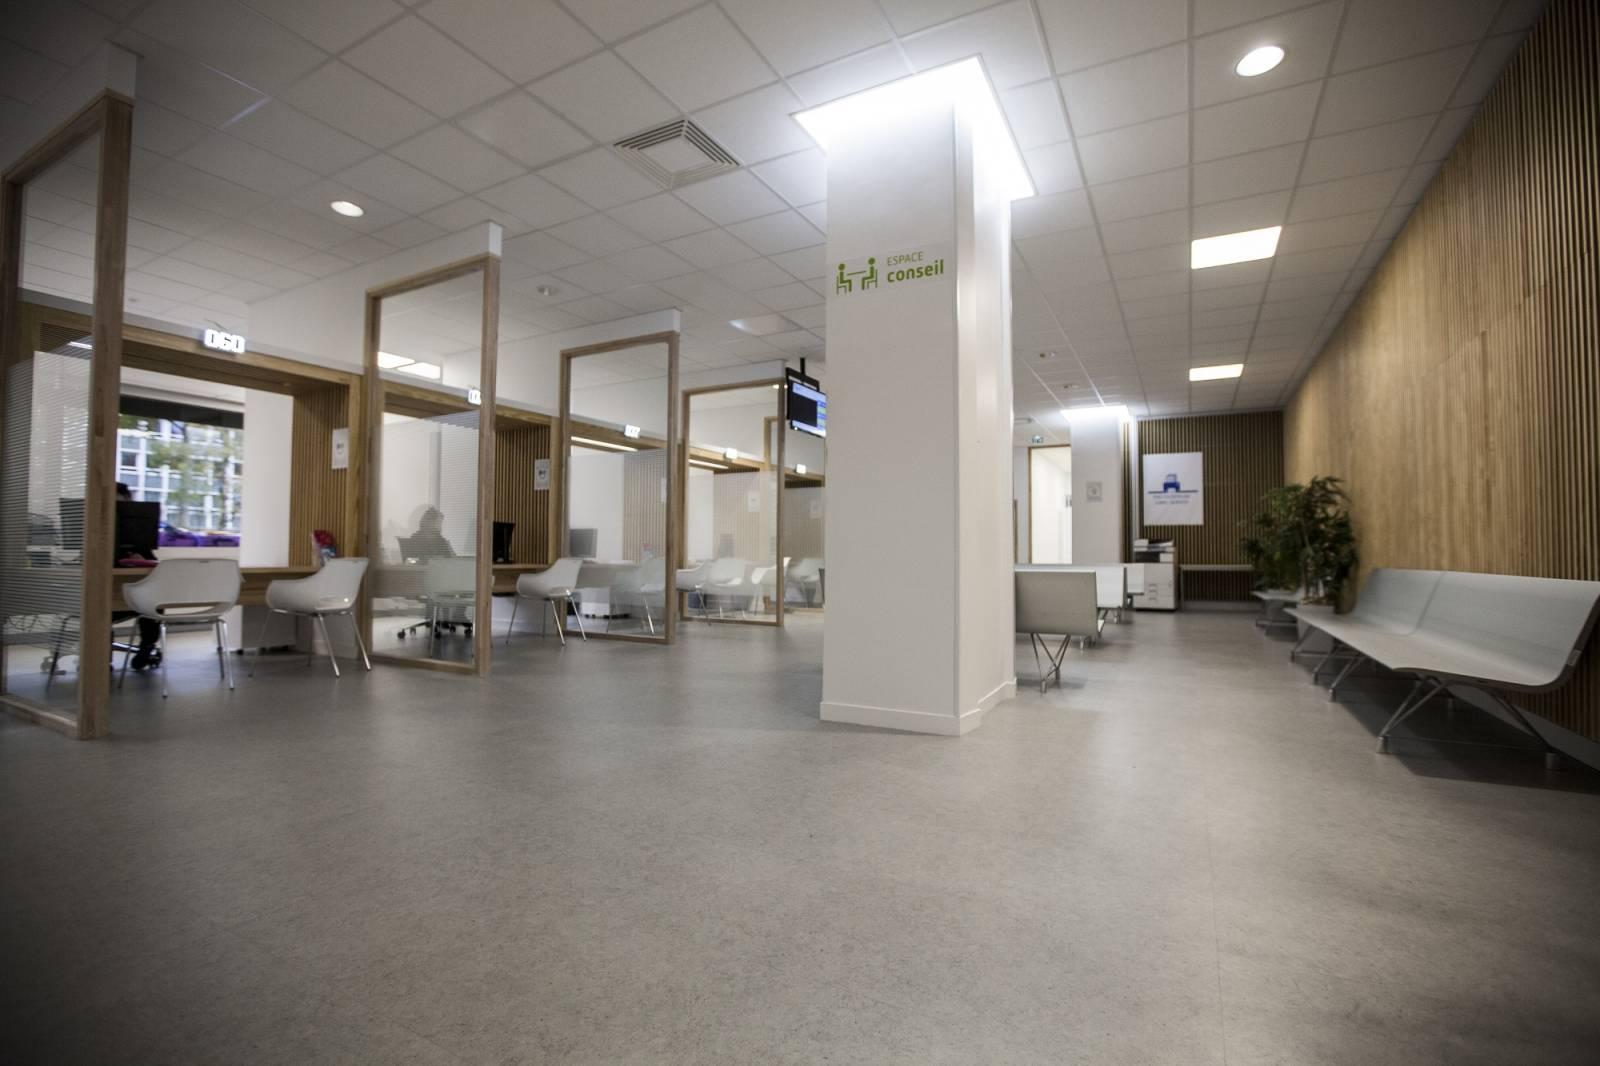 Cabinet medical rouen - Cabinet immobilier rouen ...